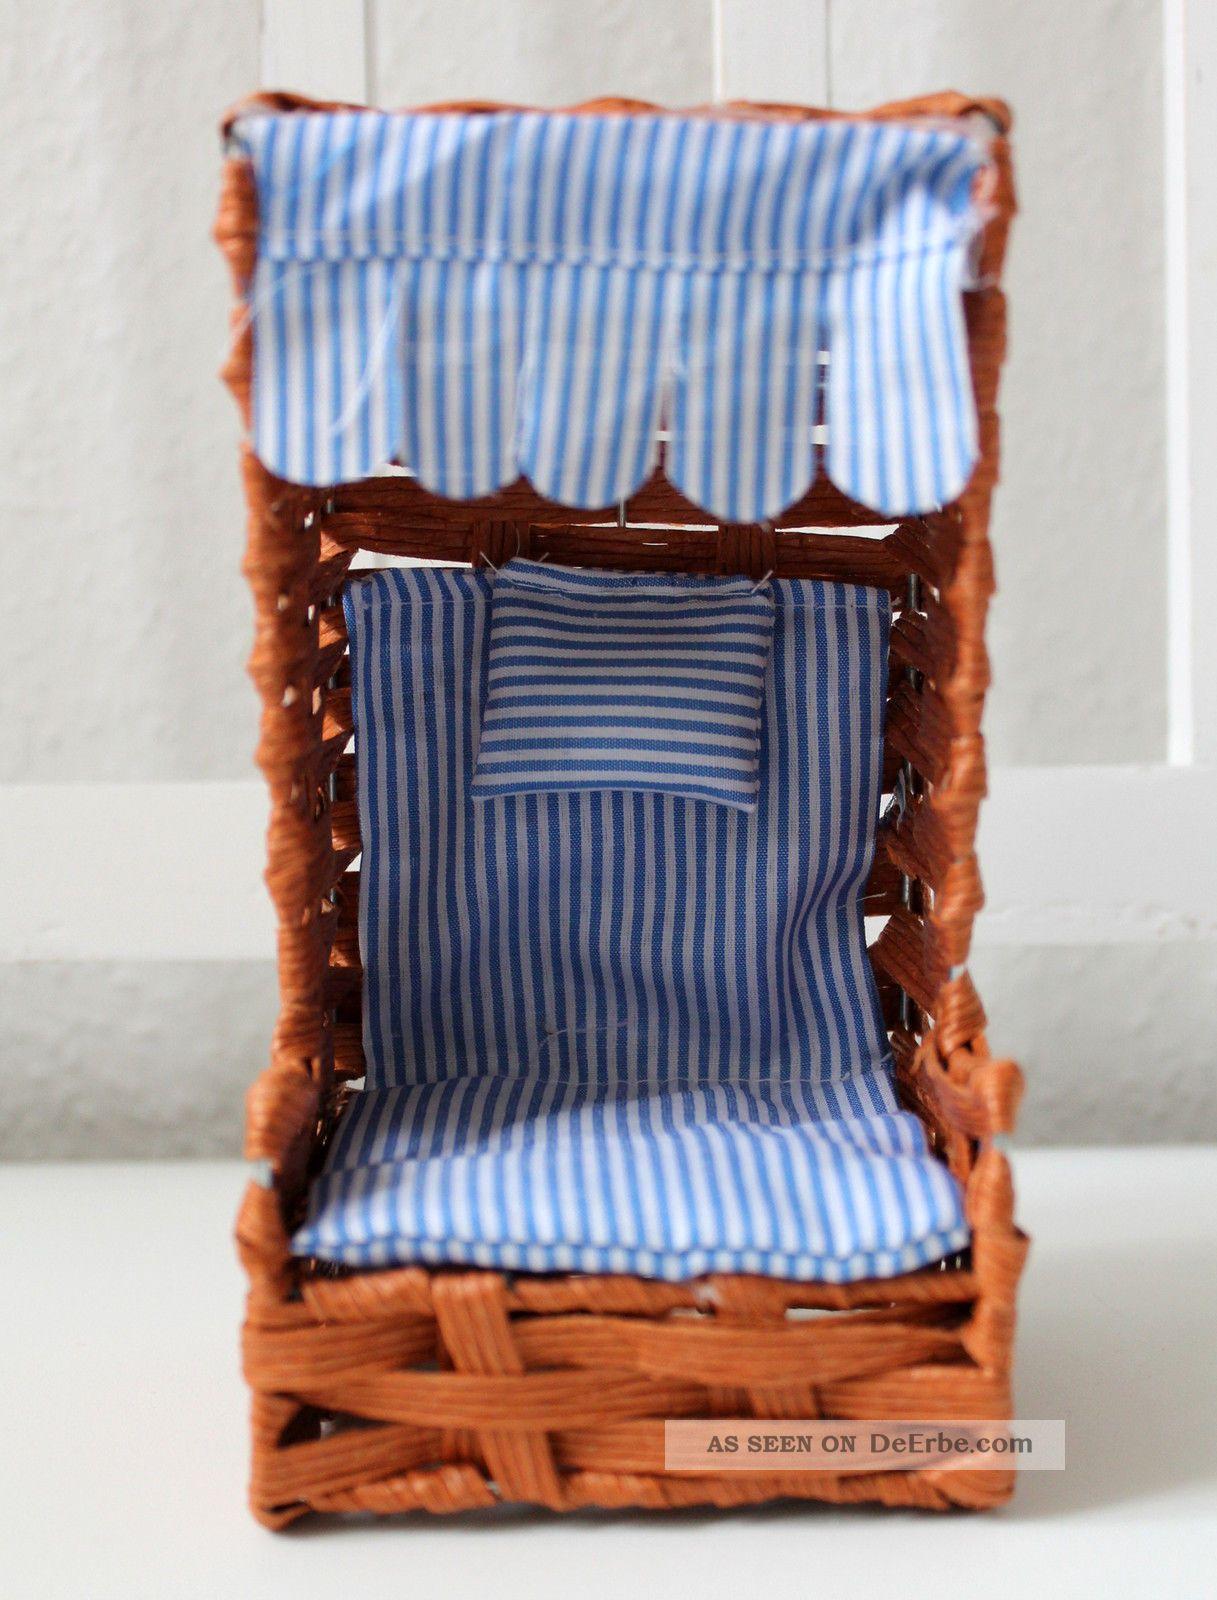 mini deko strandkorb 17cm braun draht und bast puppenstuhl. Black Bedroom Furniture Sets. Home Design Ideas